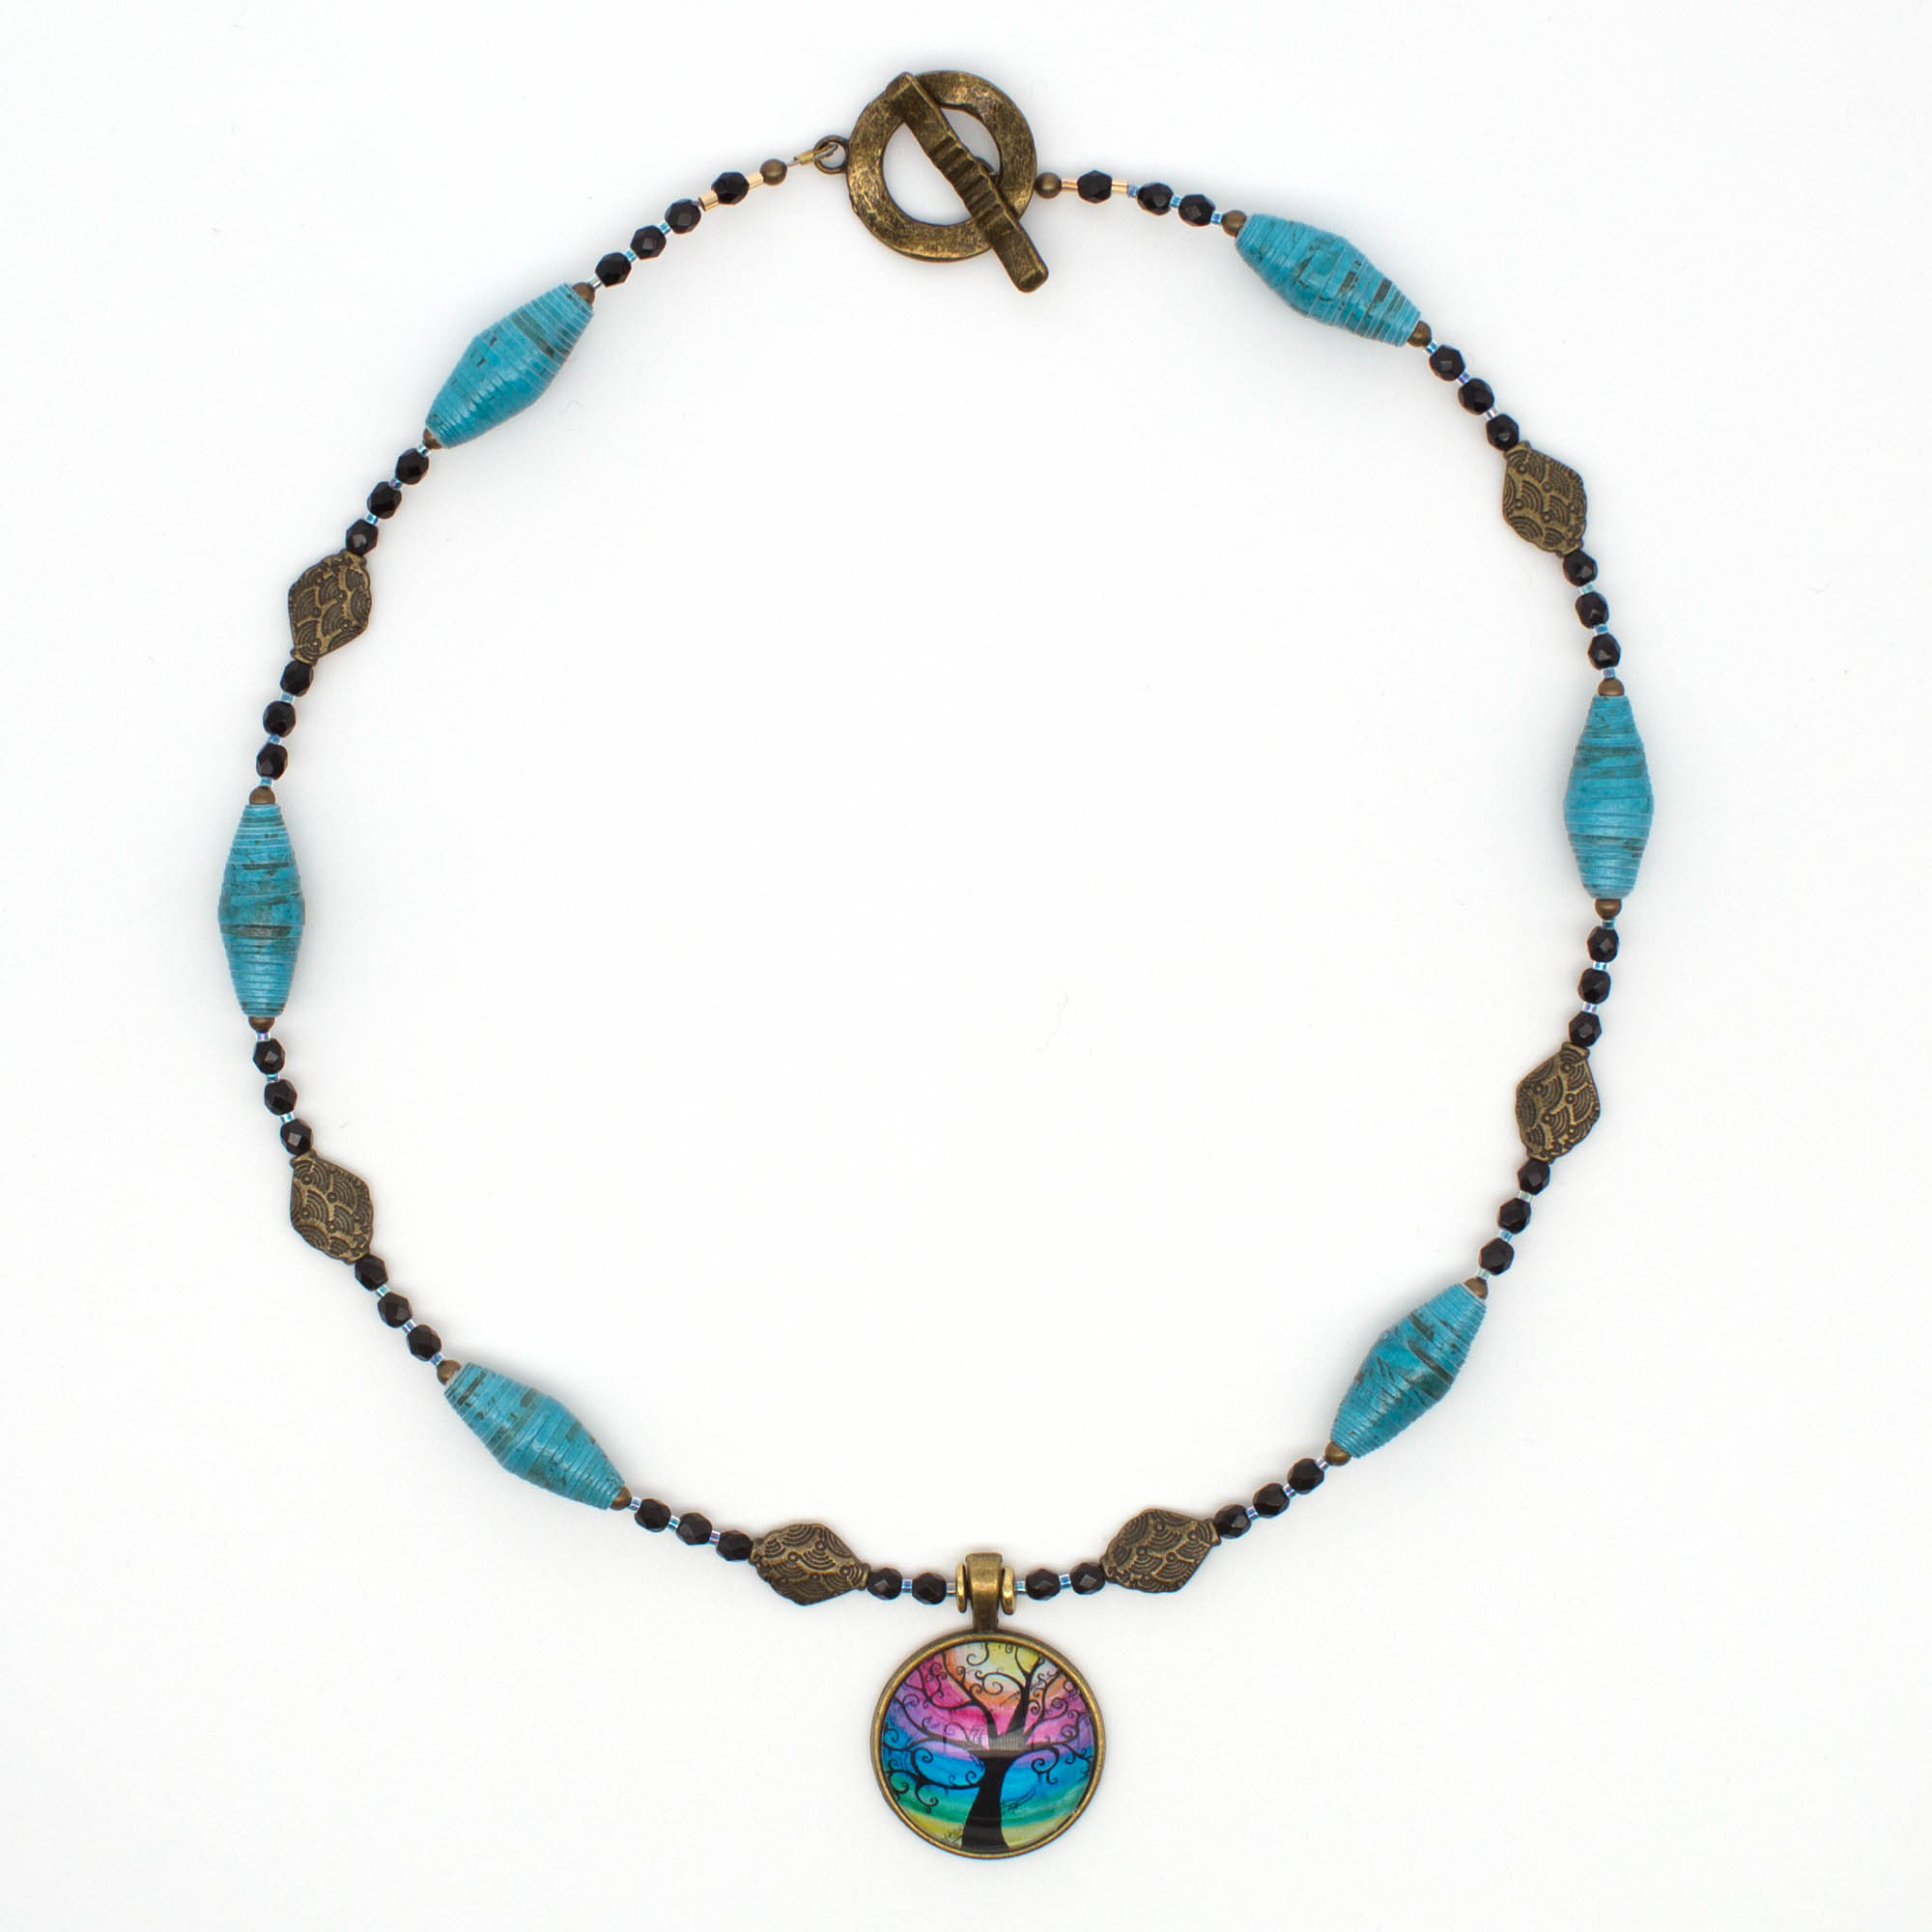 NE812a - Mystic Blues Necklace